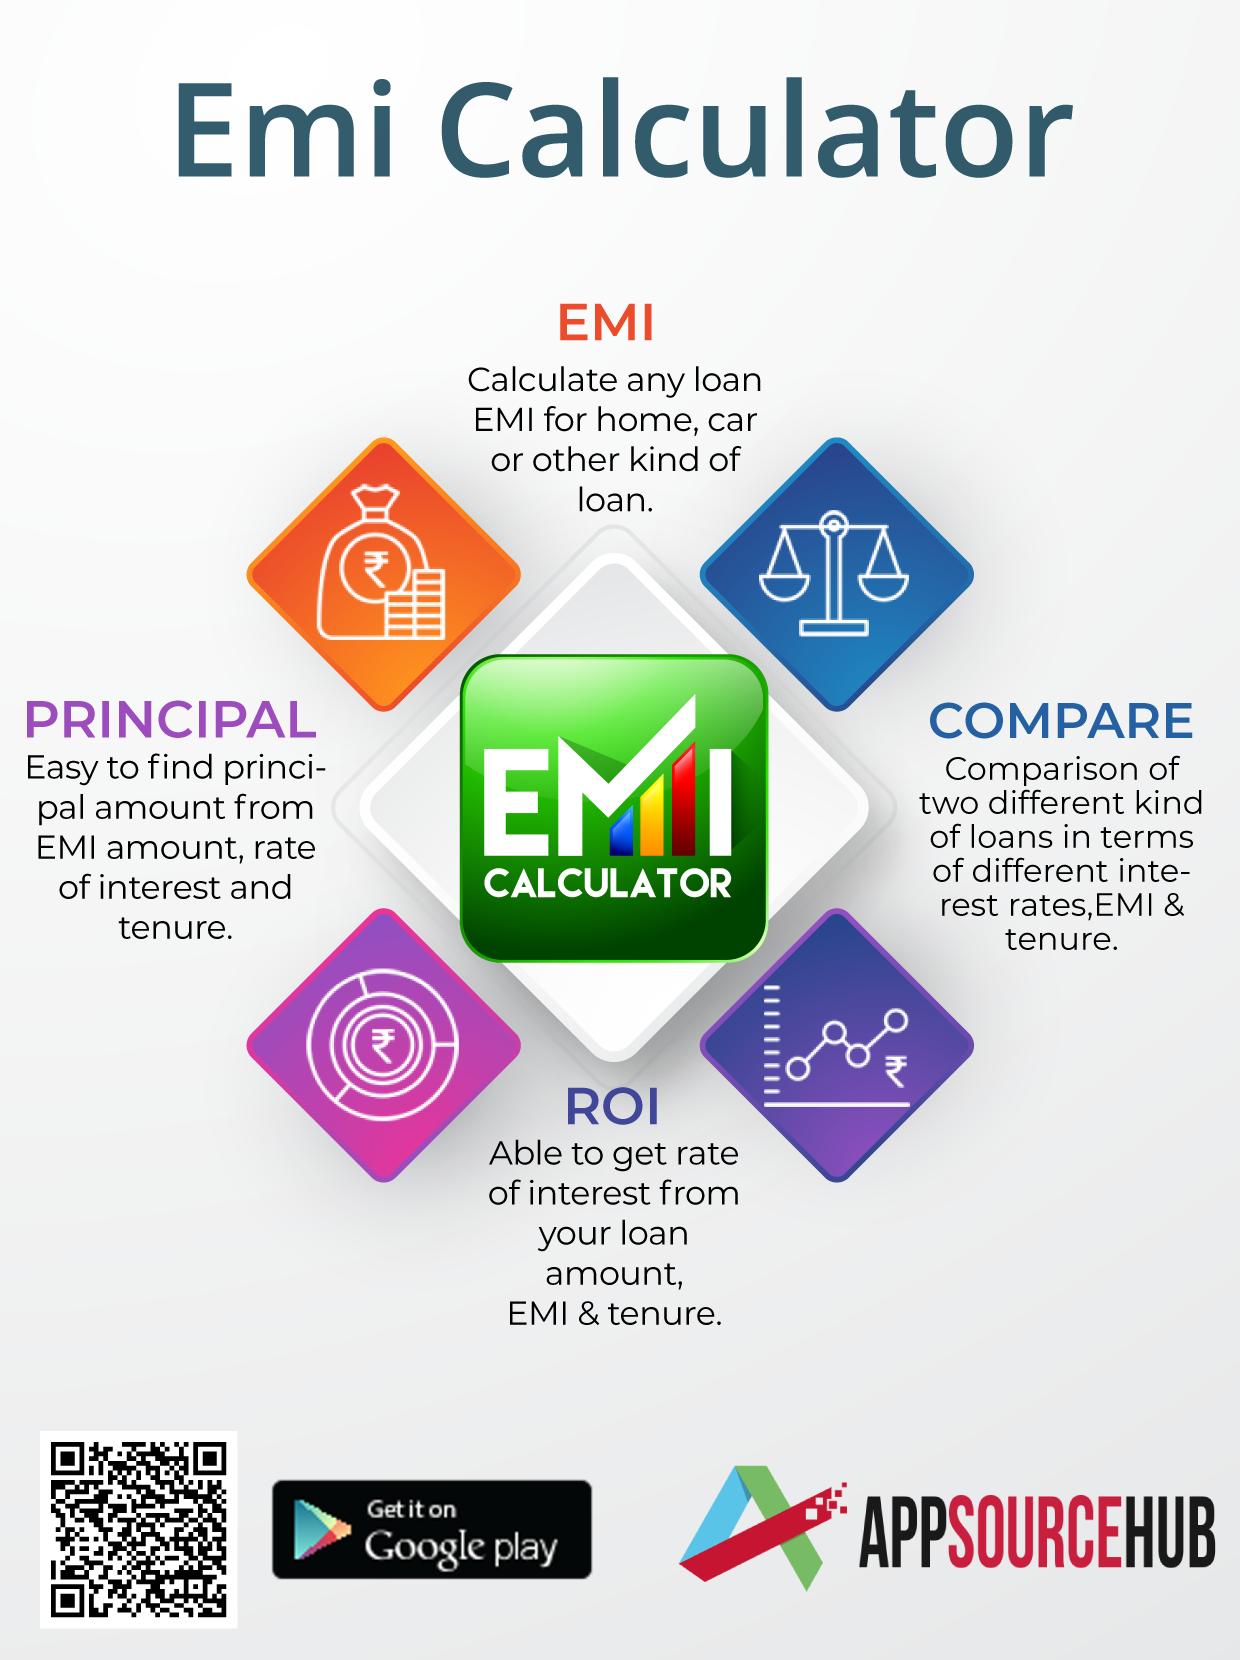 Looking For Android App With Features Like Emi Calculator Loan Calculator Car Loan Home Loan Emi Loan Tracker Educational Loan Calculator Finance Loans Loan